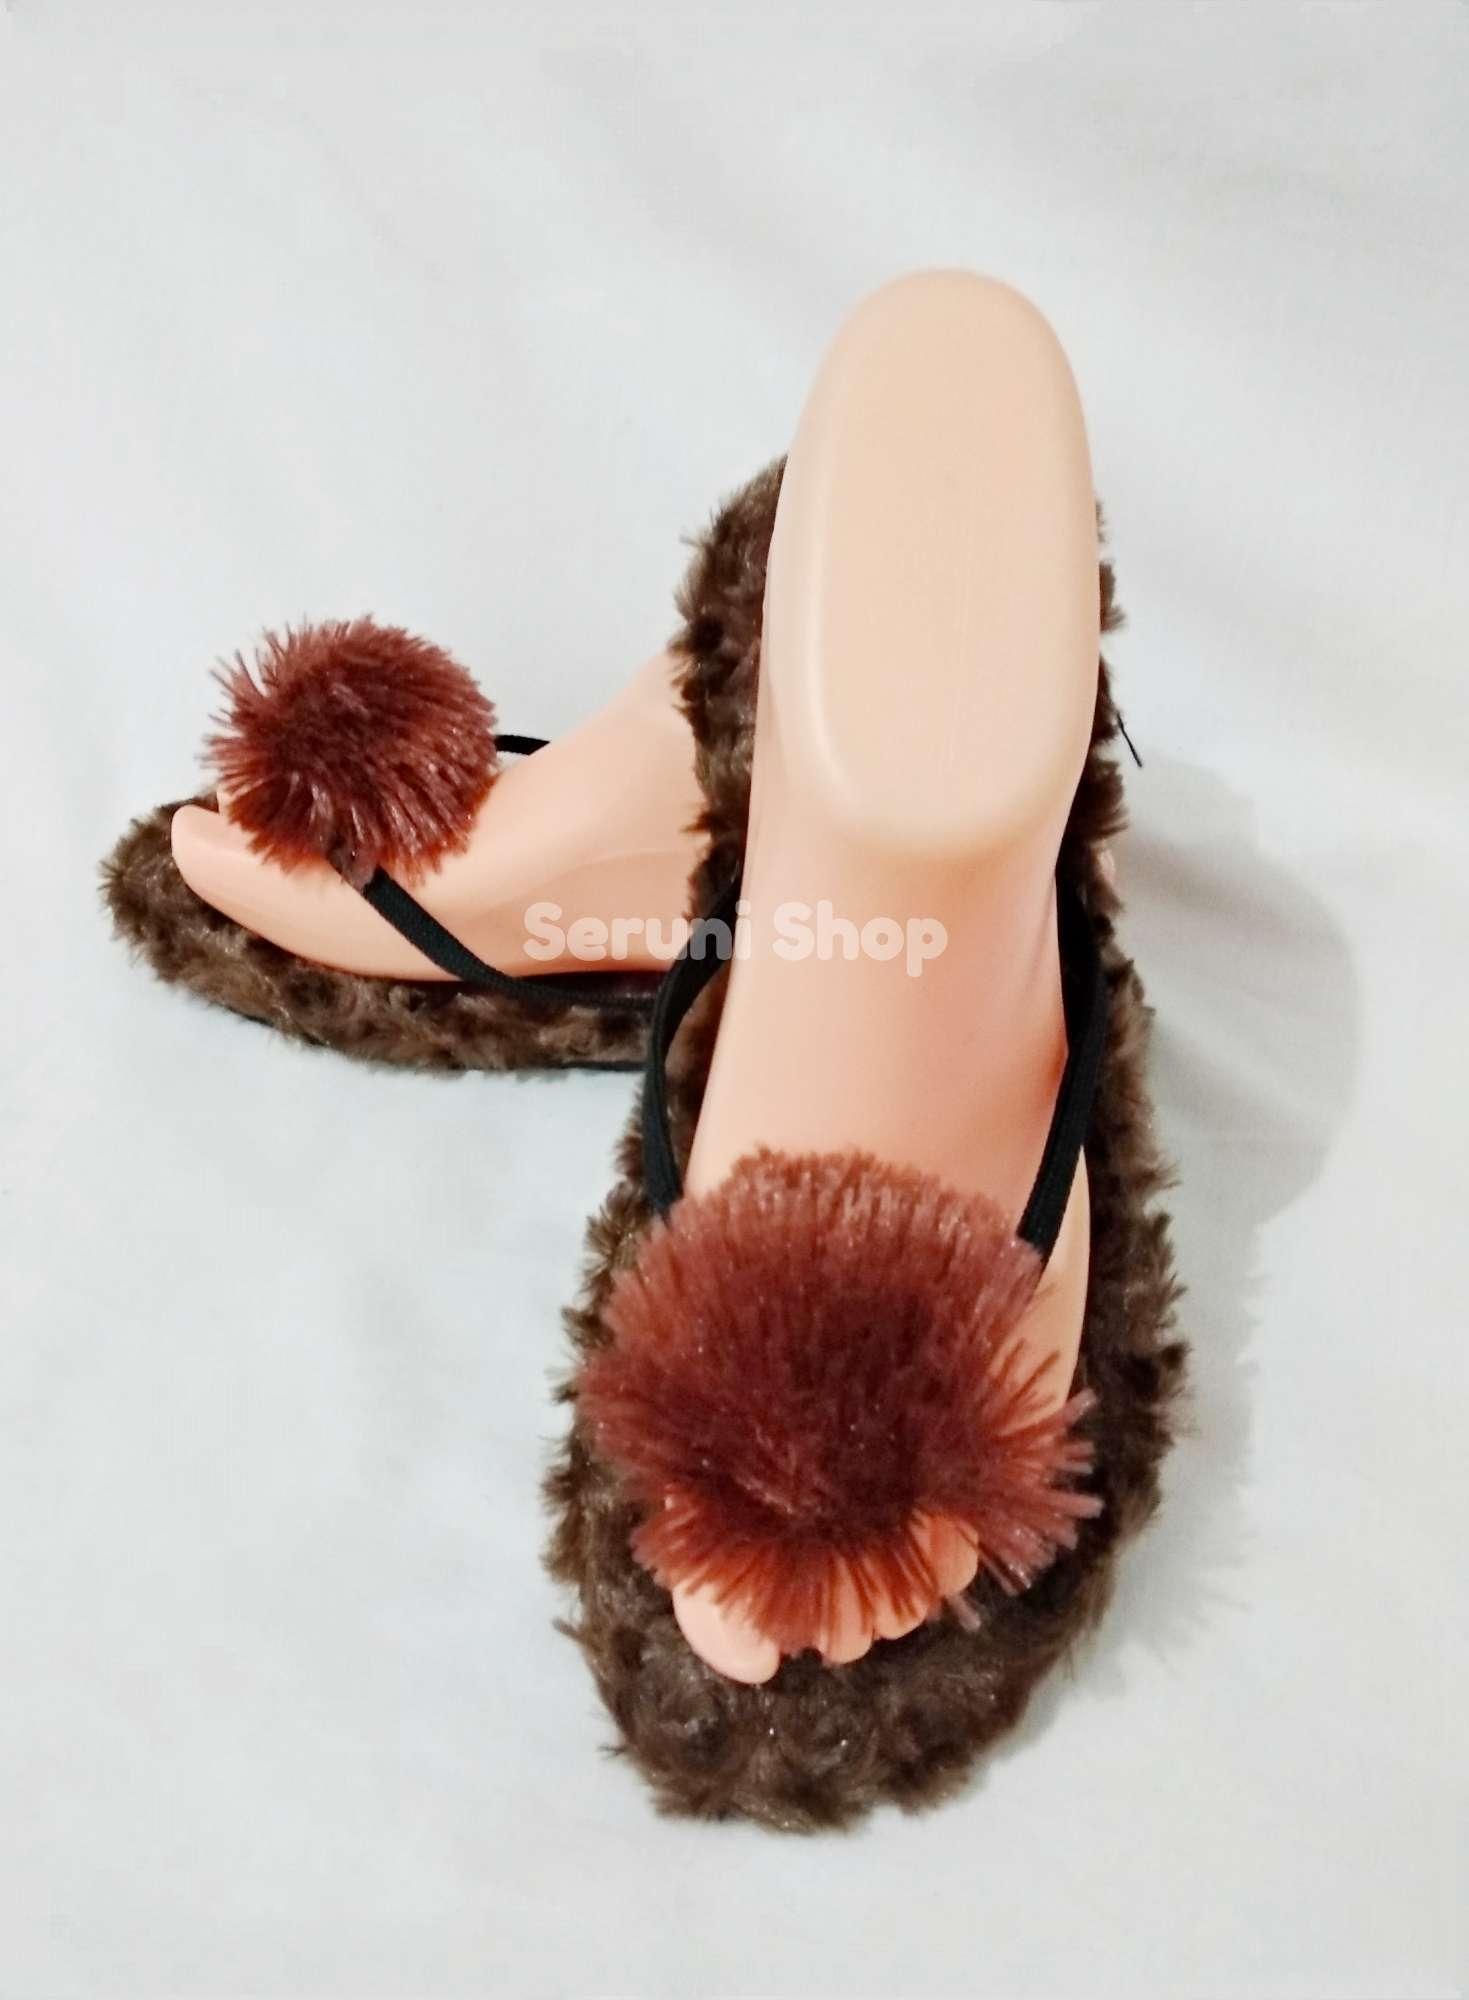 ... Seruni Flat Sandals Jepit Pom Pom Bulu Cokelat - 4